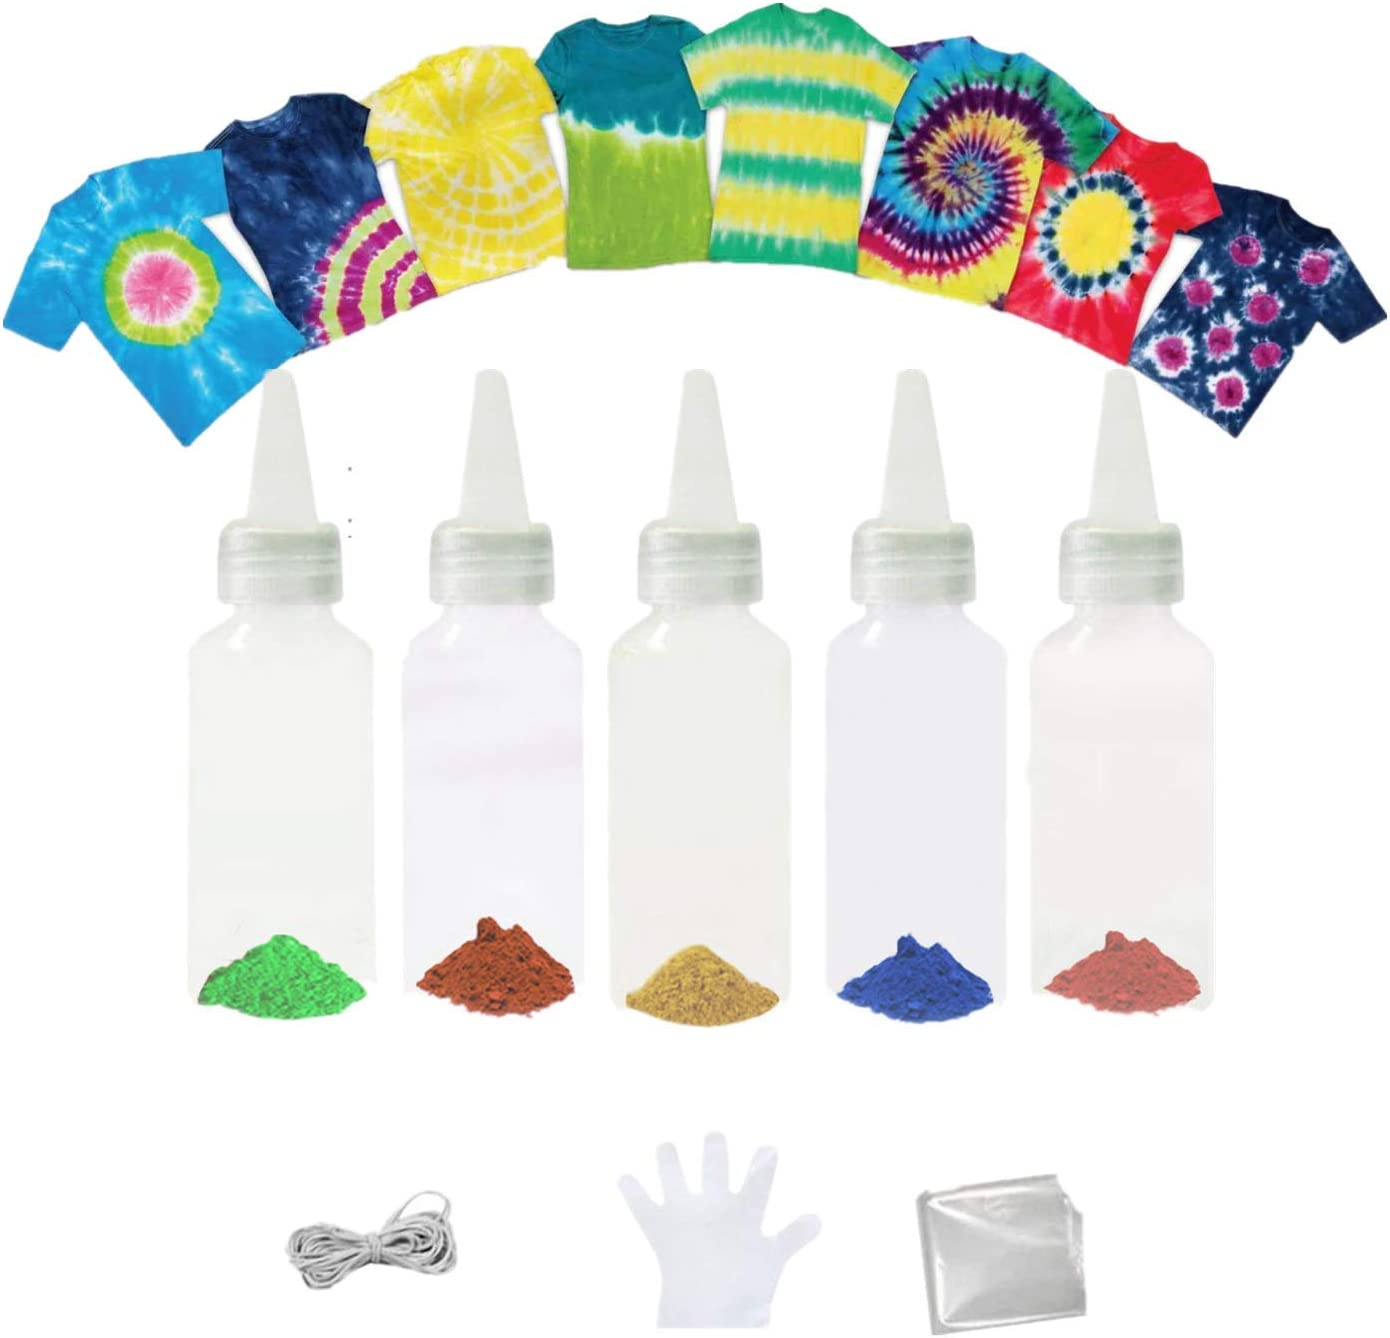 Max 57% OFF Fabric Ranking TOP20 One-Step DIY Tie-Dye Kit 5 Tie Rainbo Colors Dye Fun